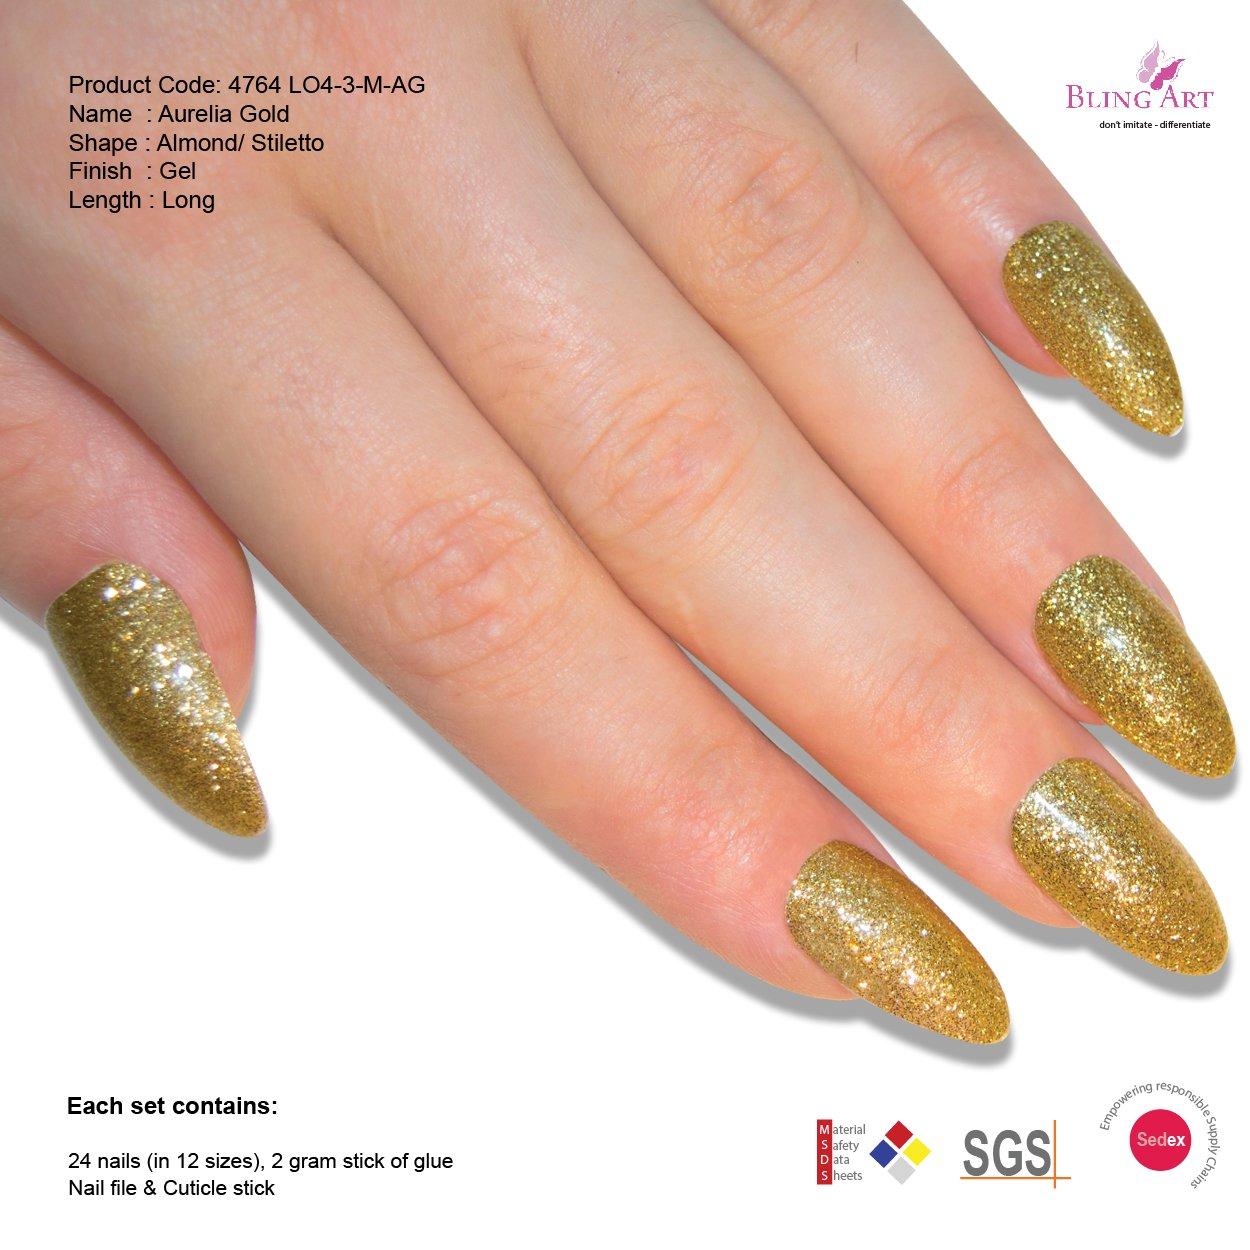 Amazon.com : Bling Art Almond False Nails Fake Stiletto Gel Gold ...